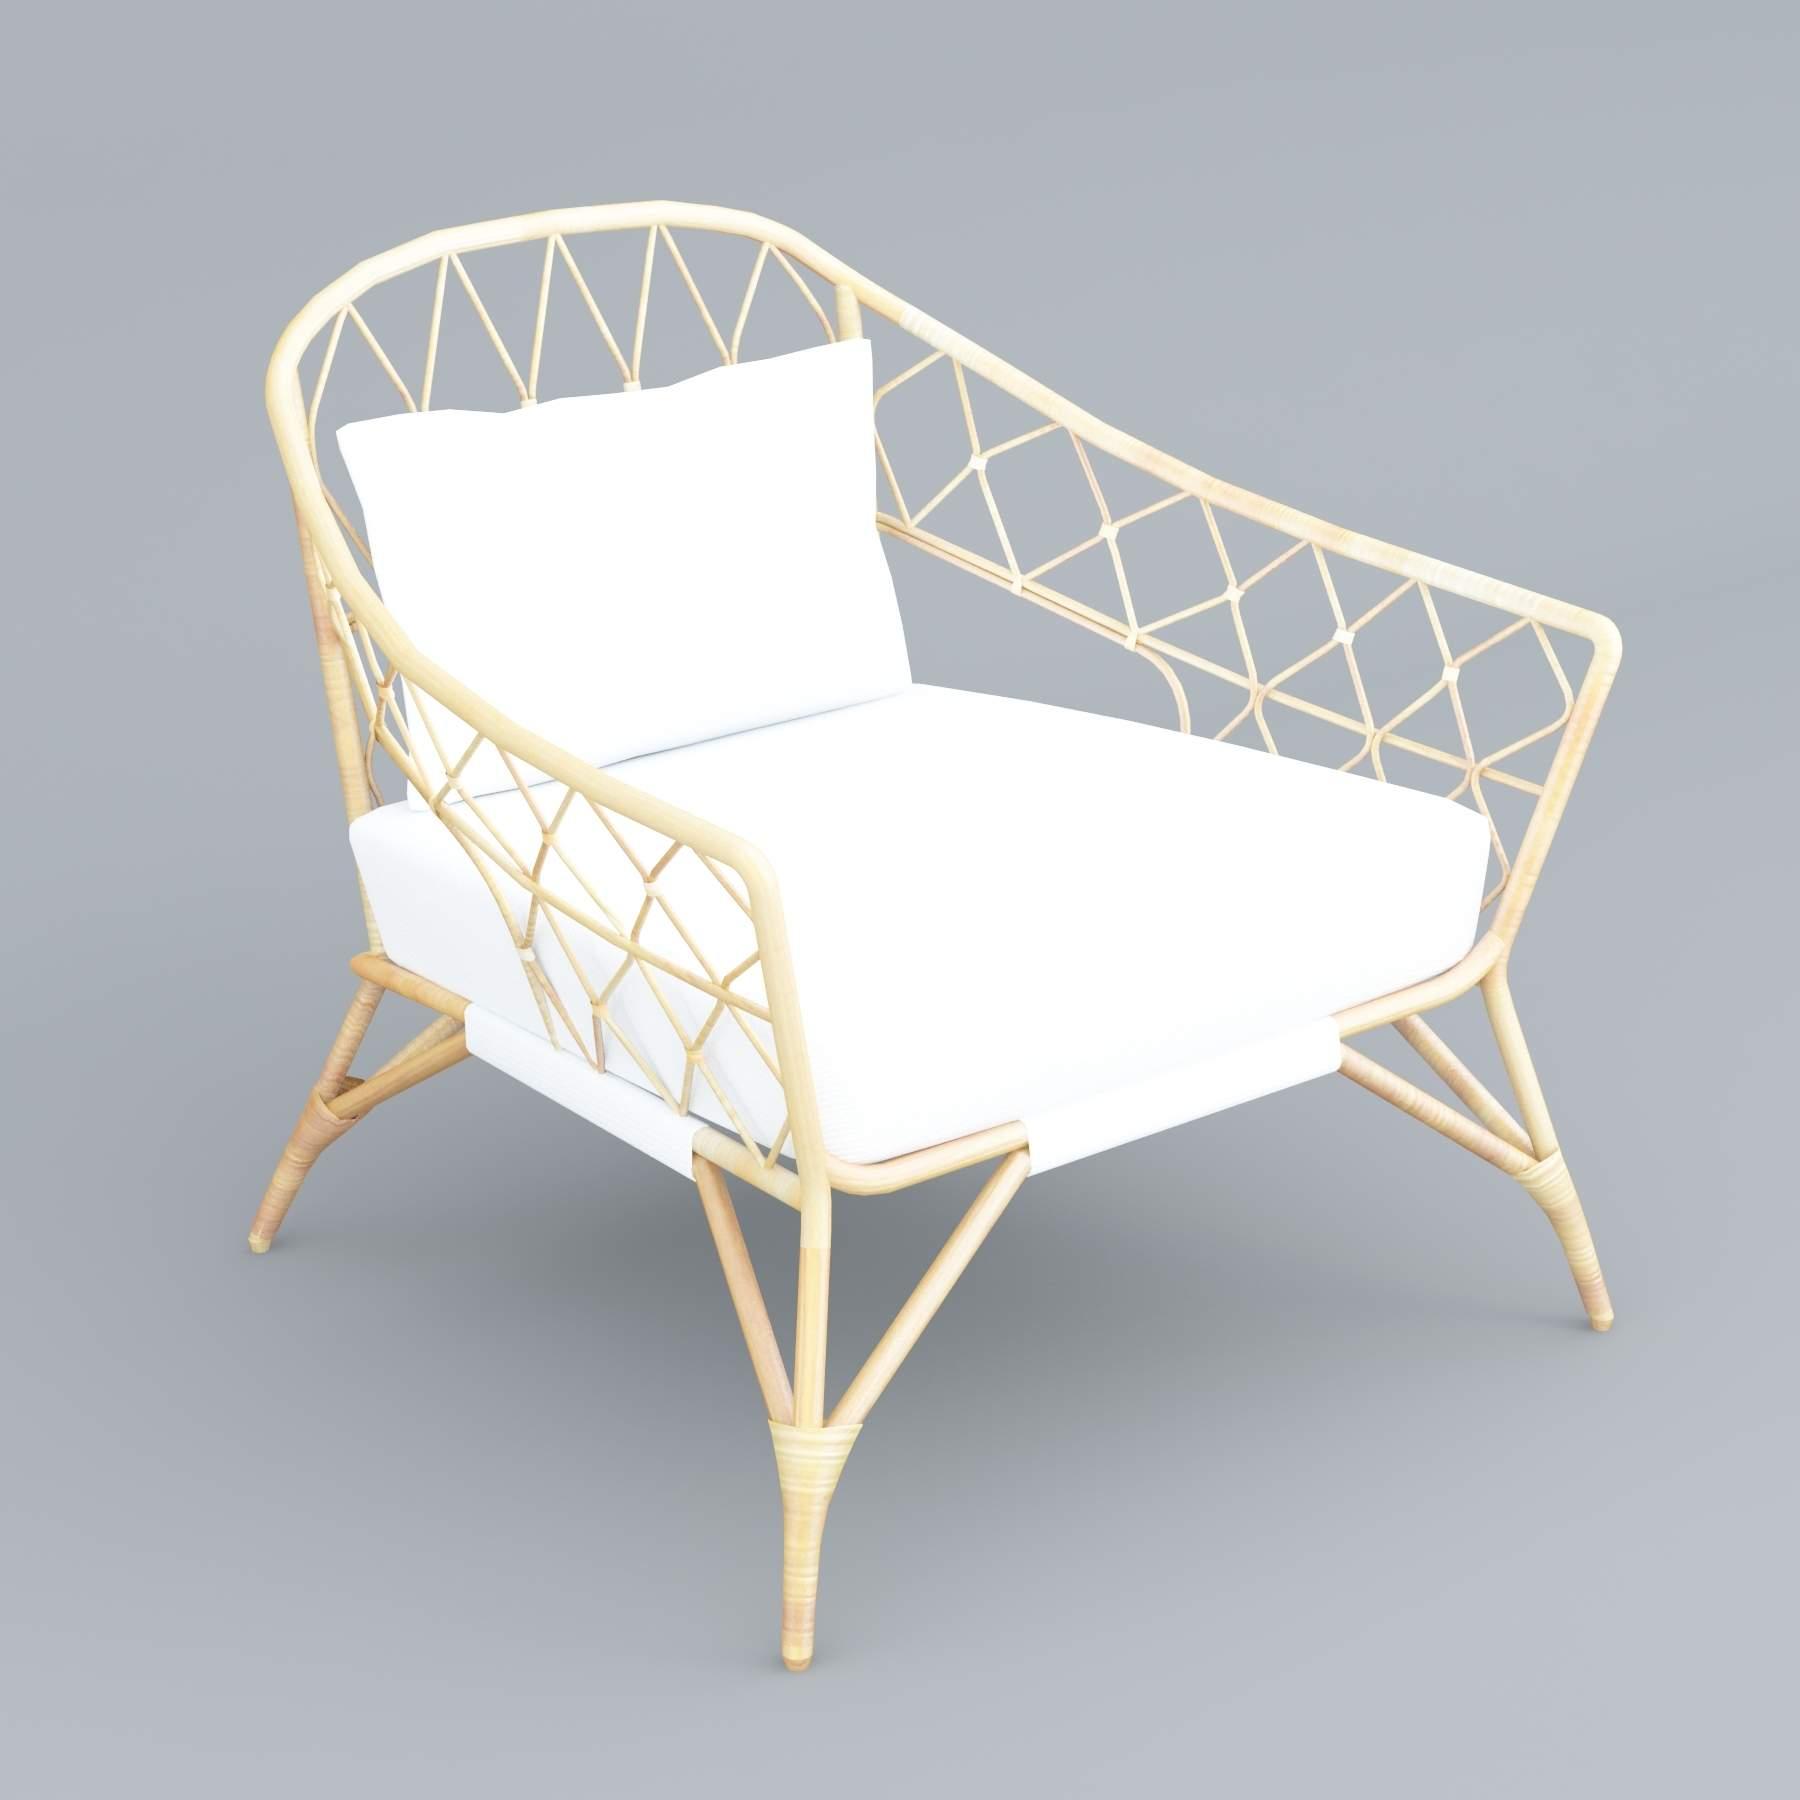 Ikea StockHolm Rattan Chair 3D Model